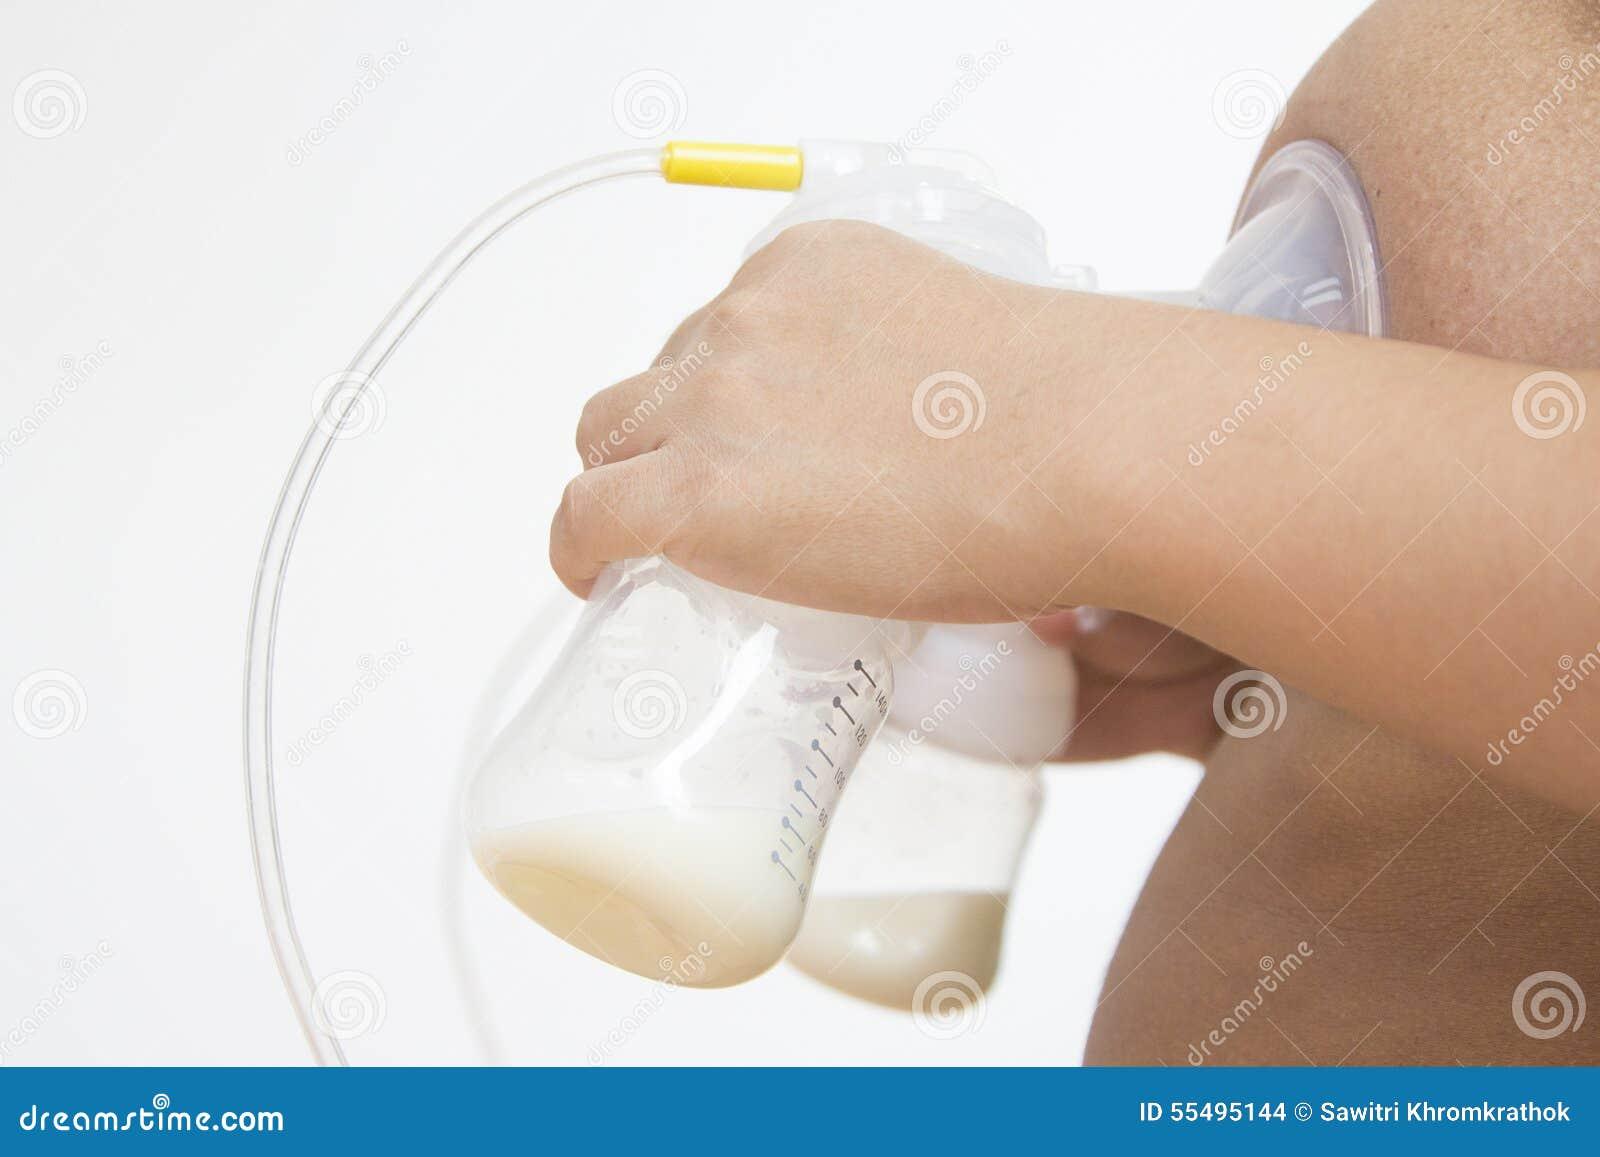 Breast milk from